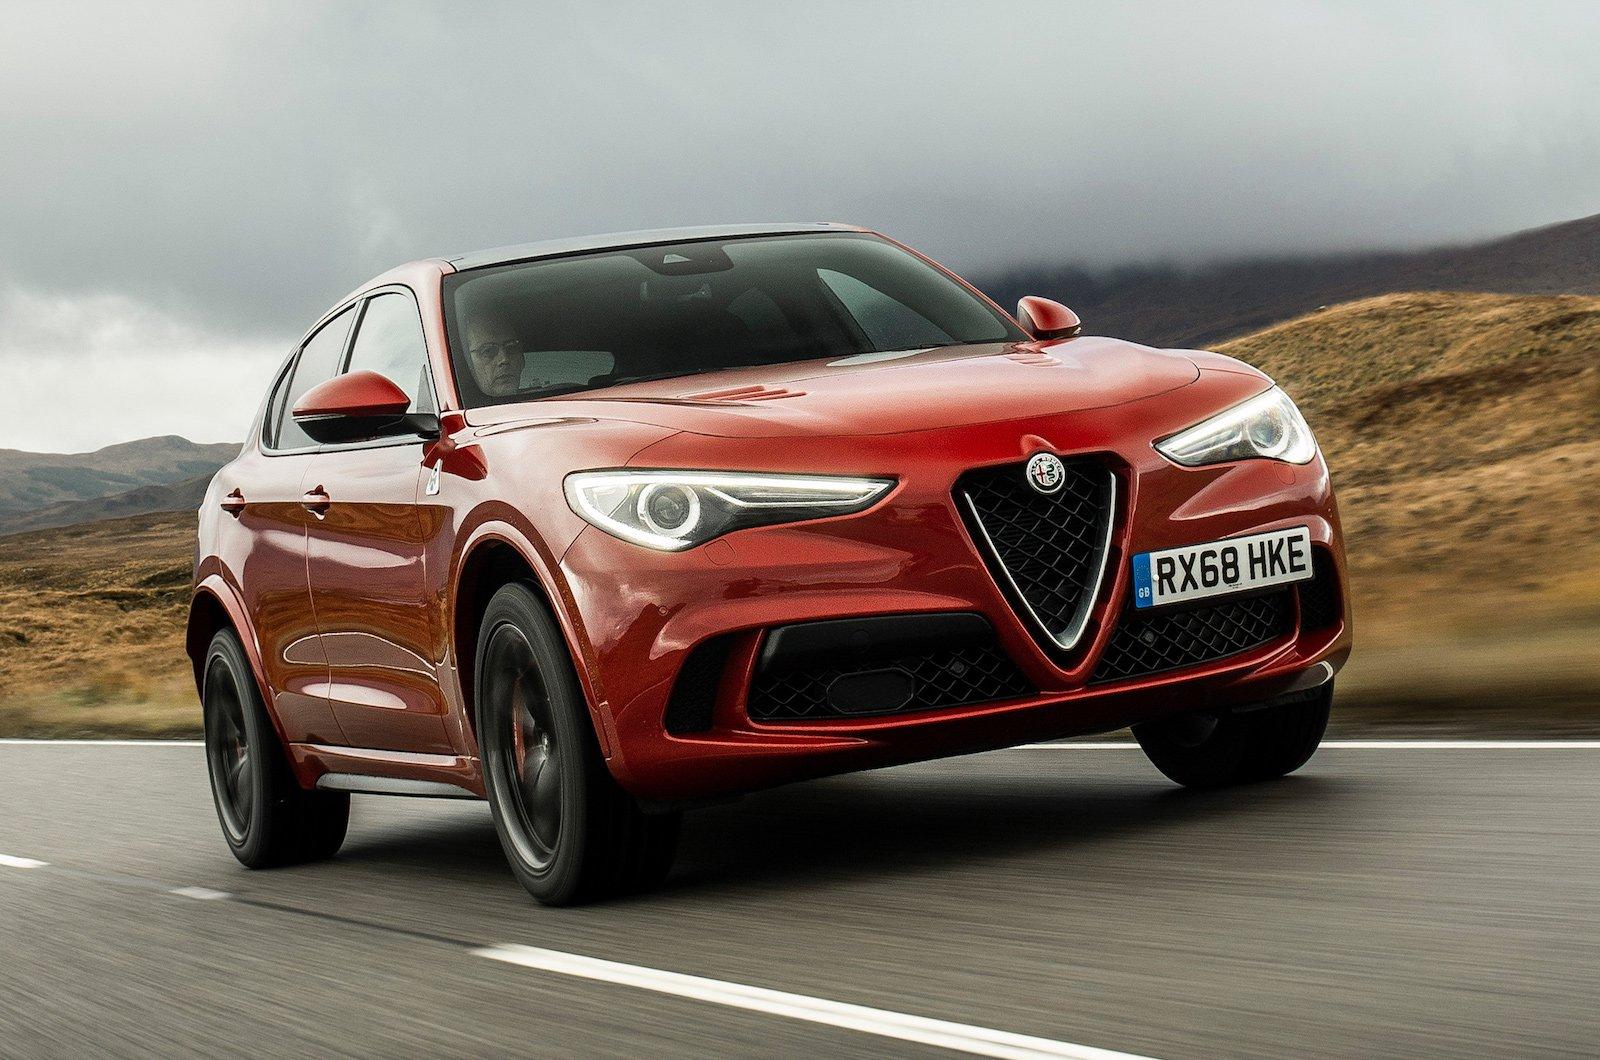 2019 Alfa Romeo Stelvio Quadrifoglio Review Price Specs And